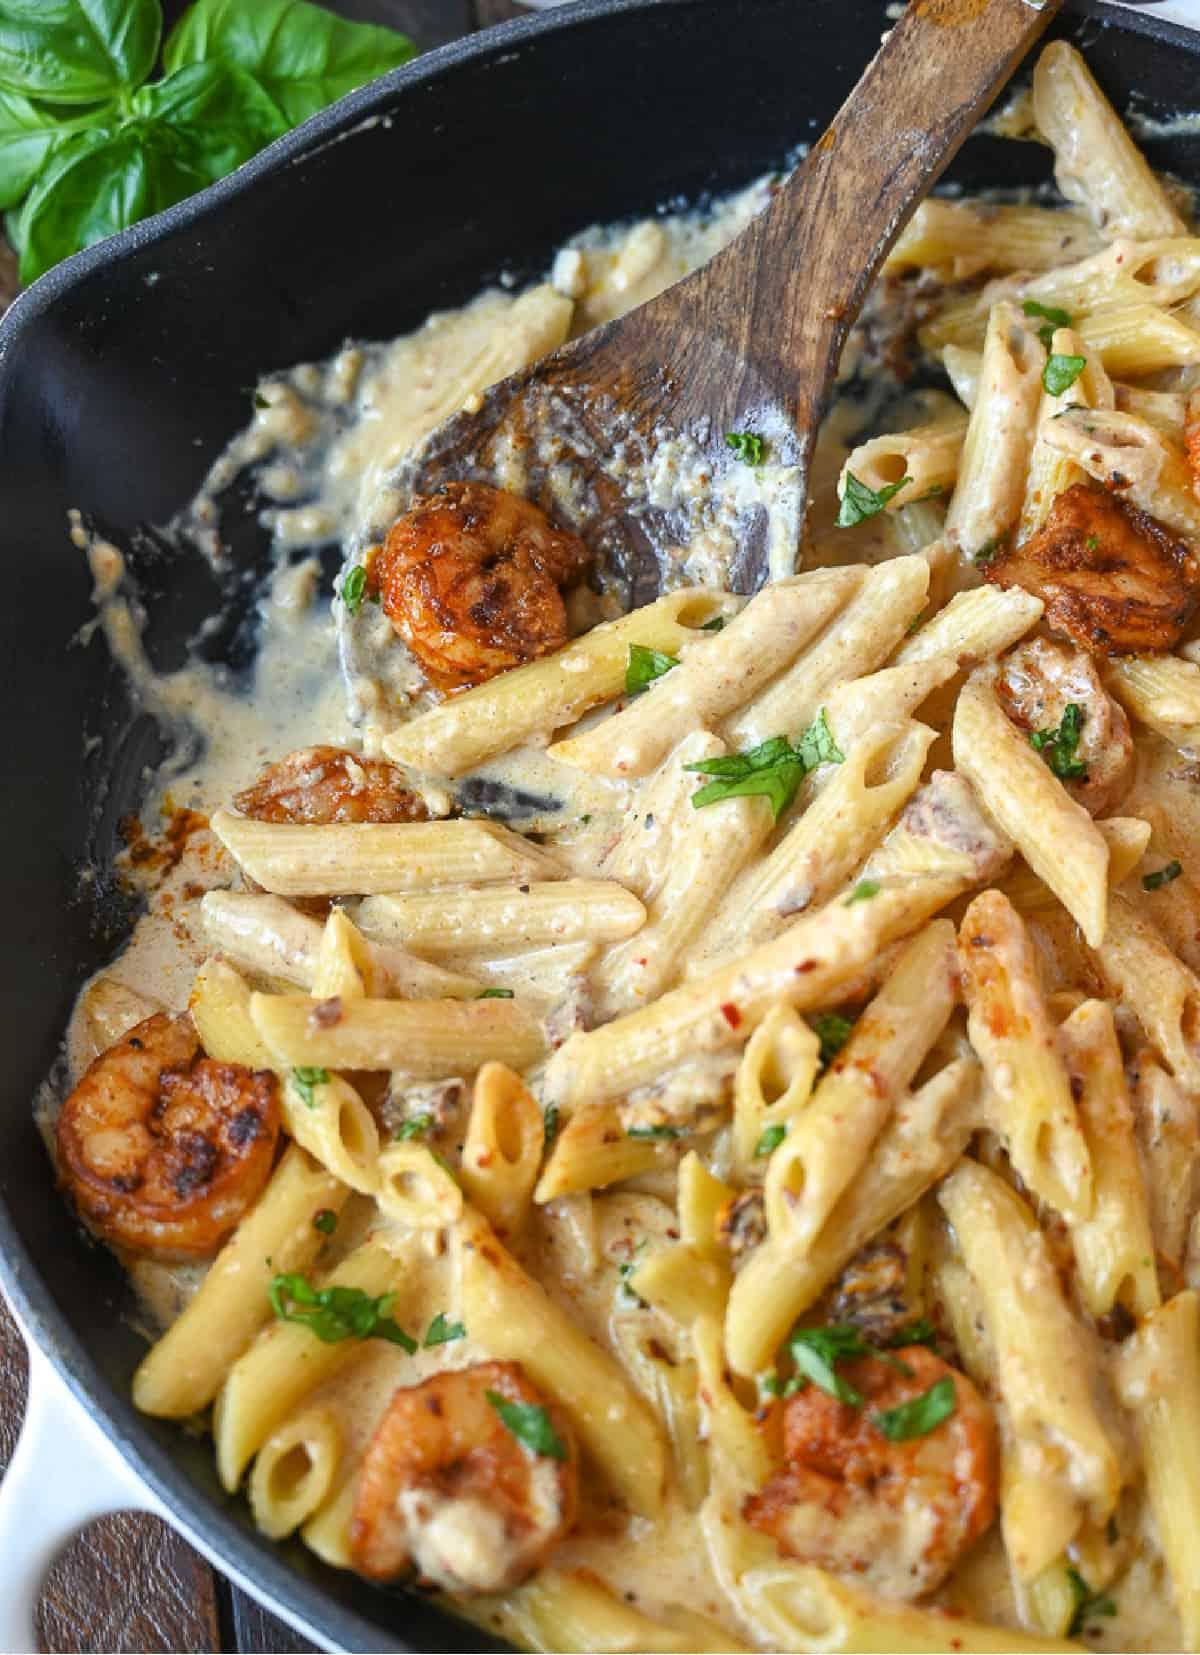 Creamy garlic shrimp pasta in a skillet with a wooden spoon.